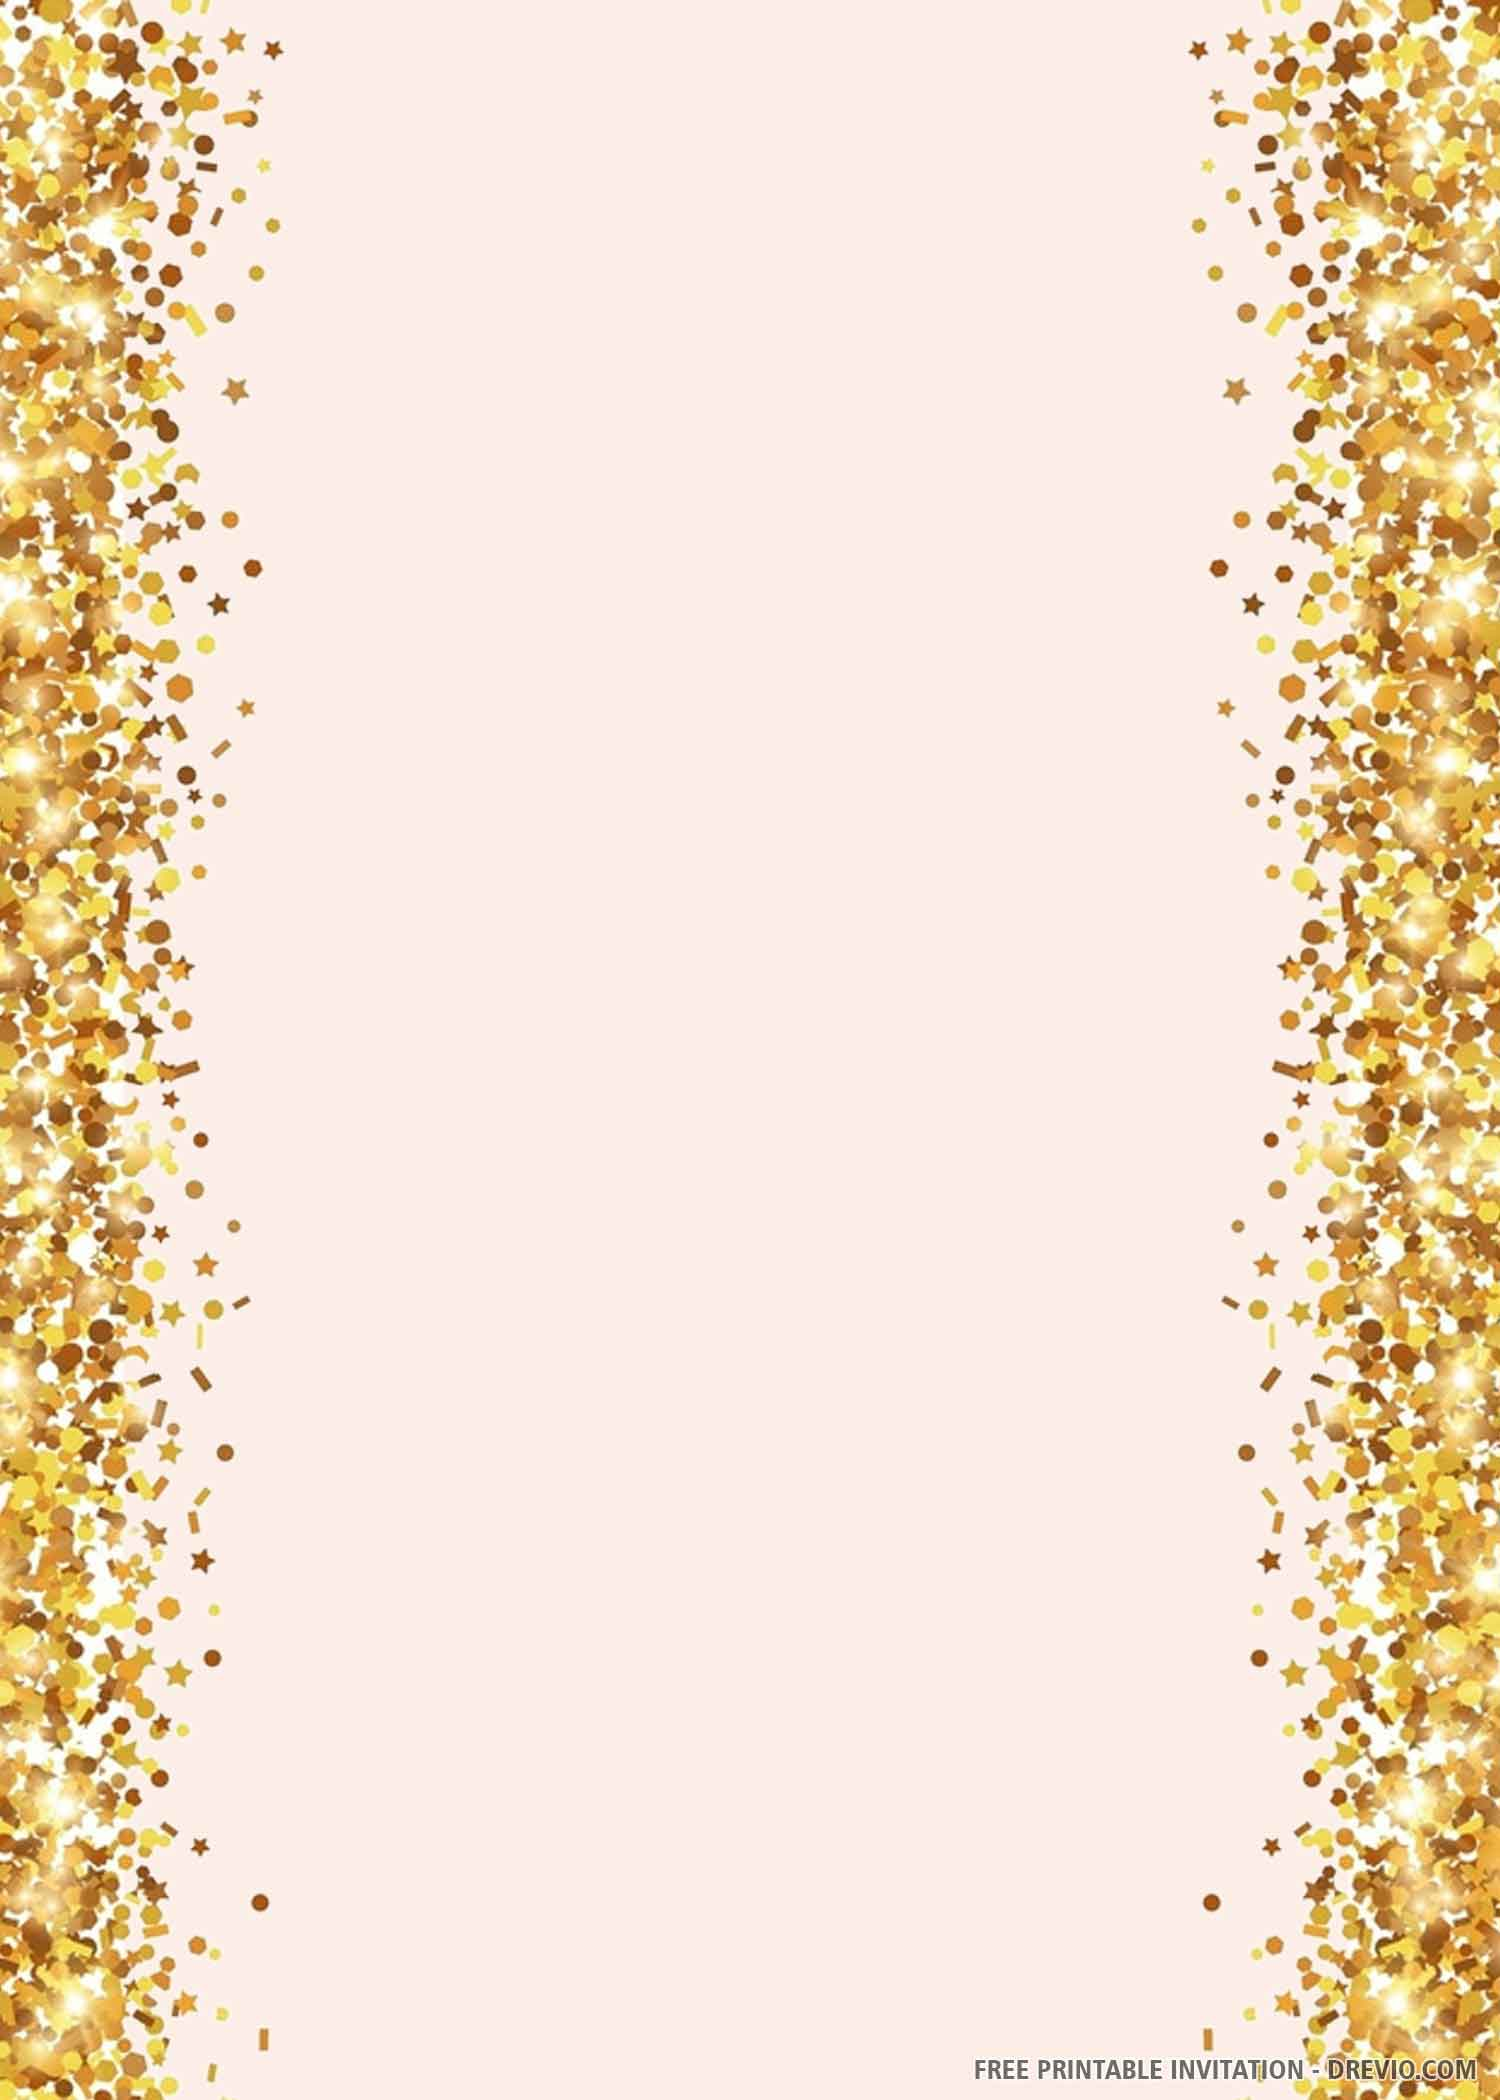 Free Printable Pink And Gold Wedding Invitation